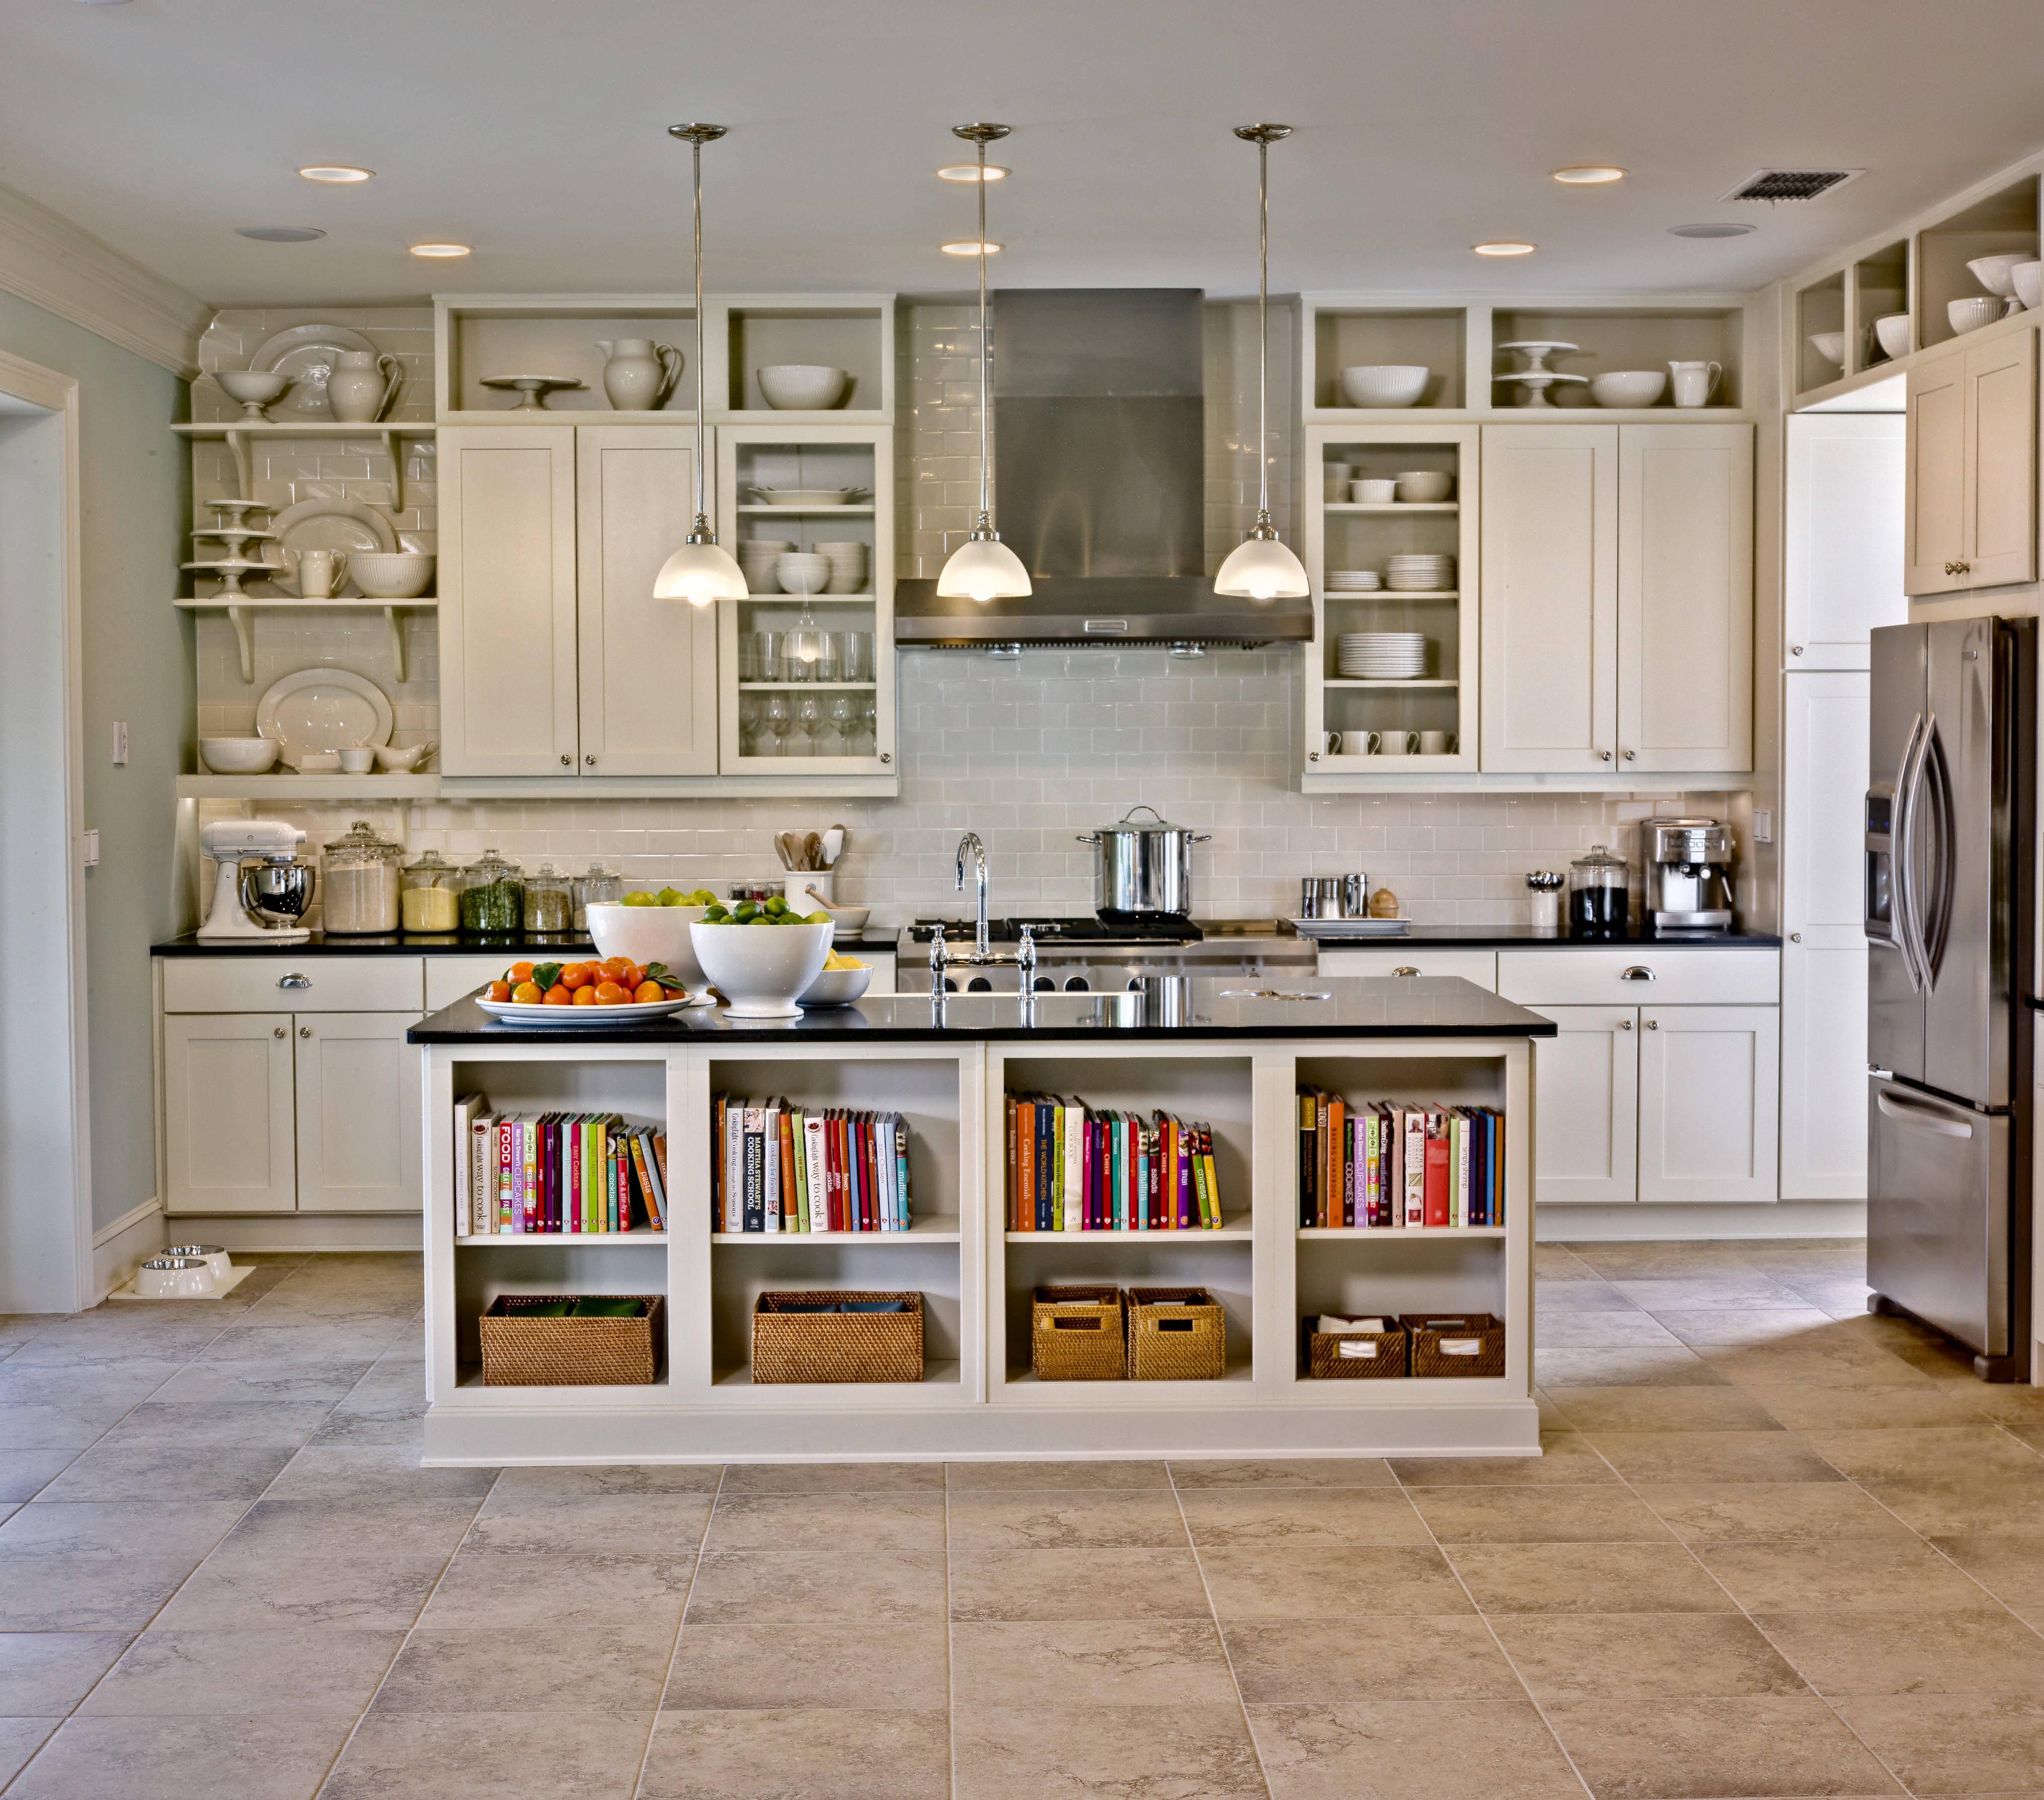 Kitchen food storage cabinets Photo - 1